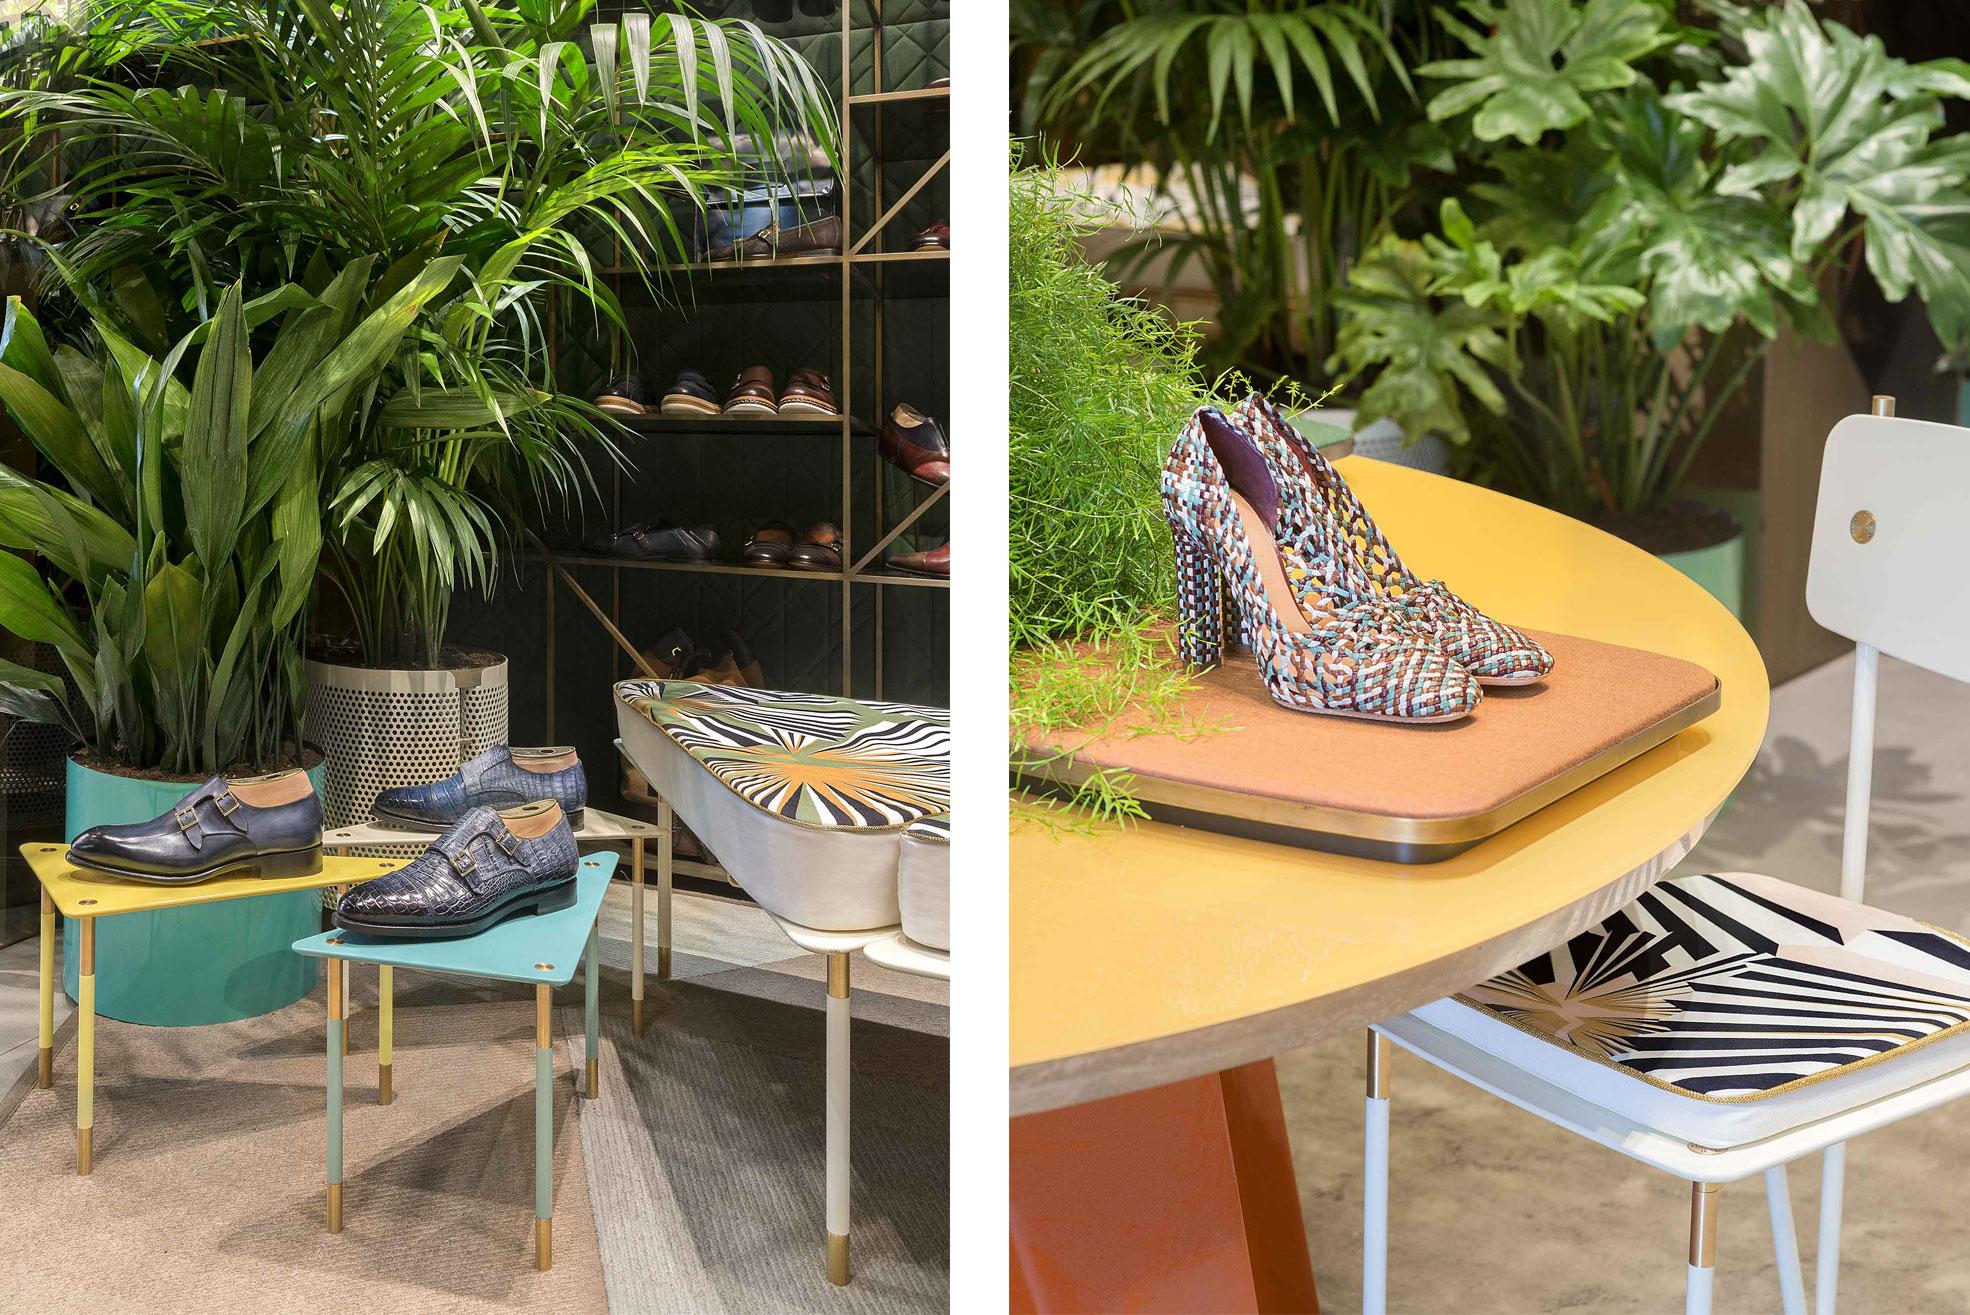 Chair and coffee table of Aquiloni Furniture by Derek Castiglioni in the Santoni Milan Boutique Photographer Maria Teresa Furnari